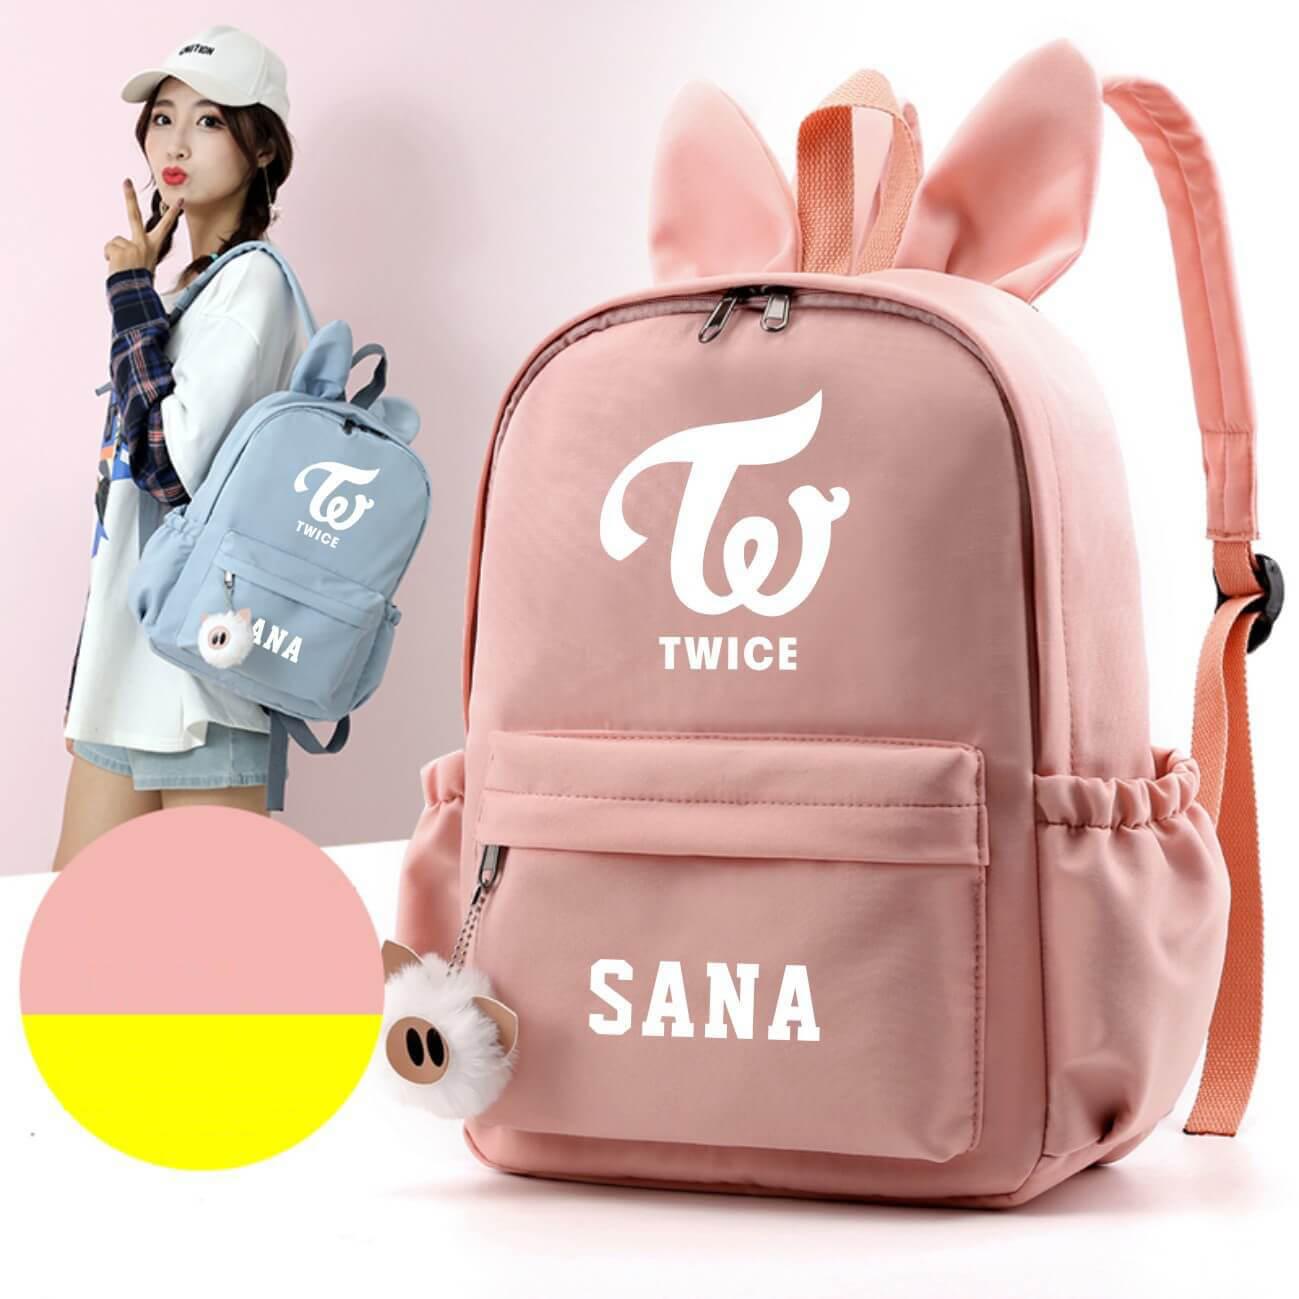 TWICE Cute Design Rabbit Ears Korean Backpack